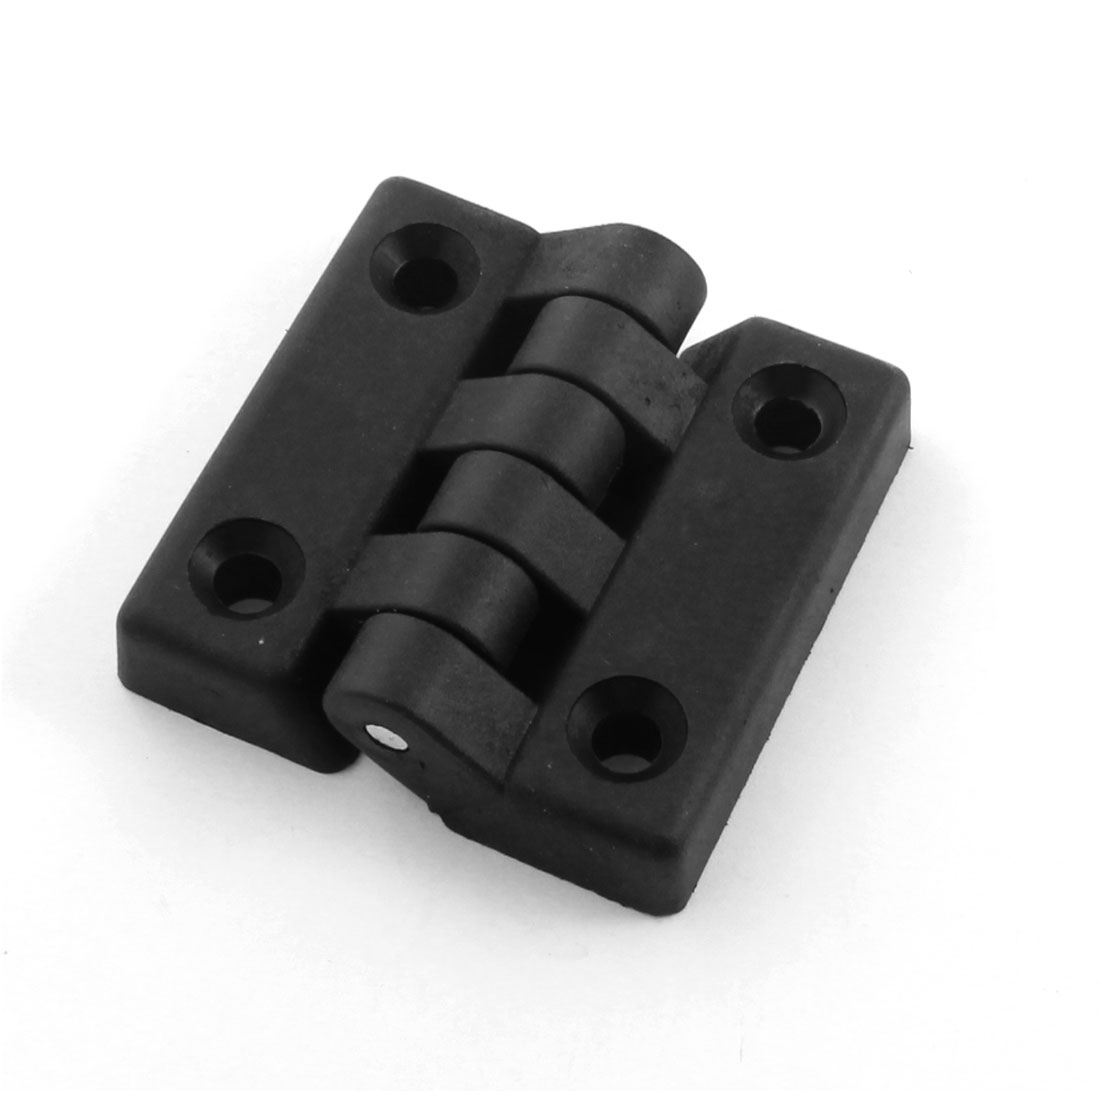 Reinforced Black Nylon Countersunk Hole Butt Door Hinge